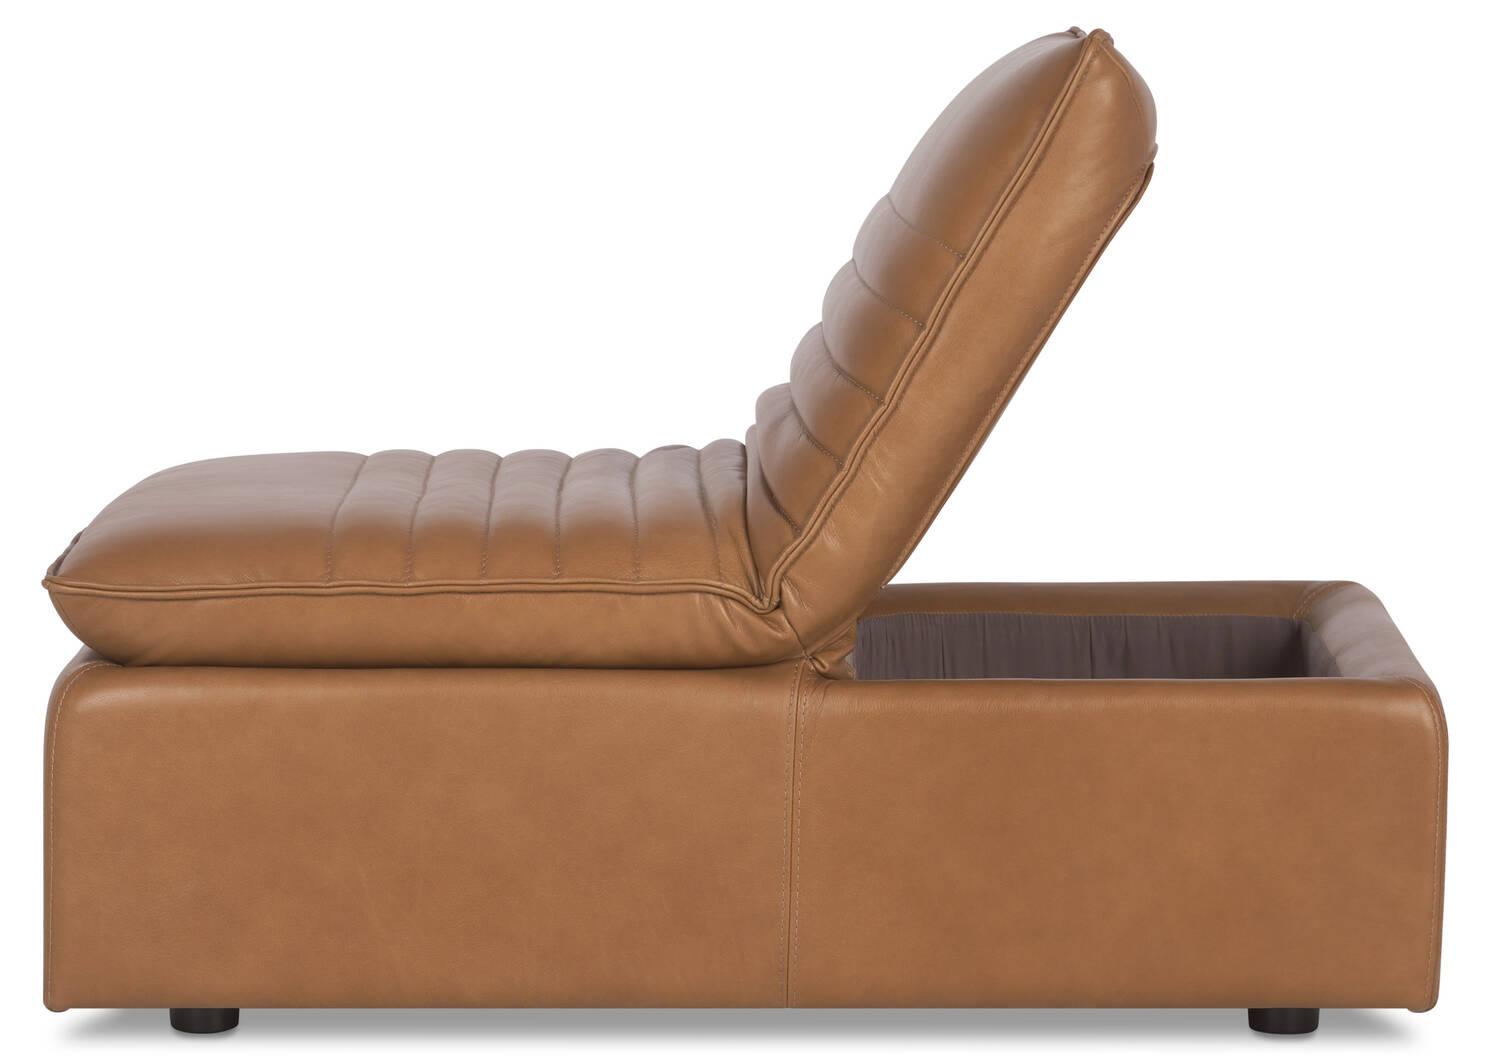 R-pieds en cuir Skylar -Adler brun clair